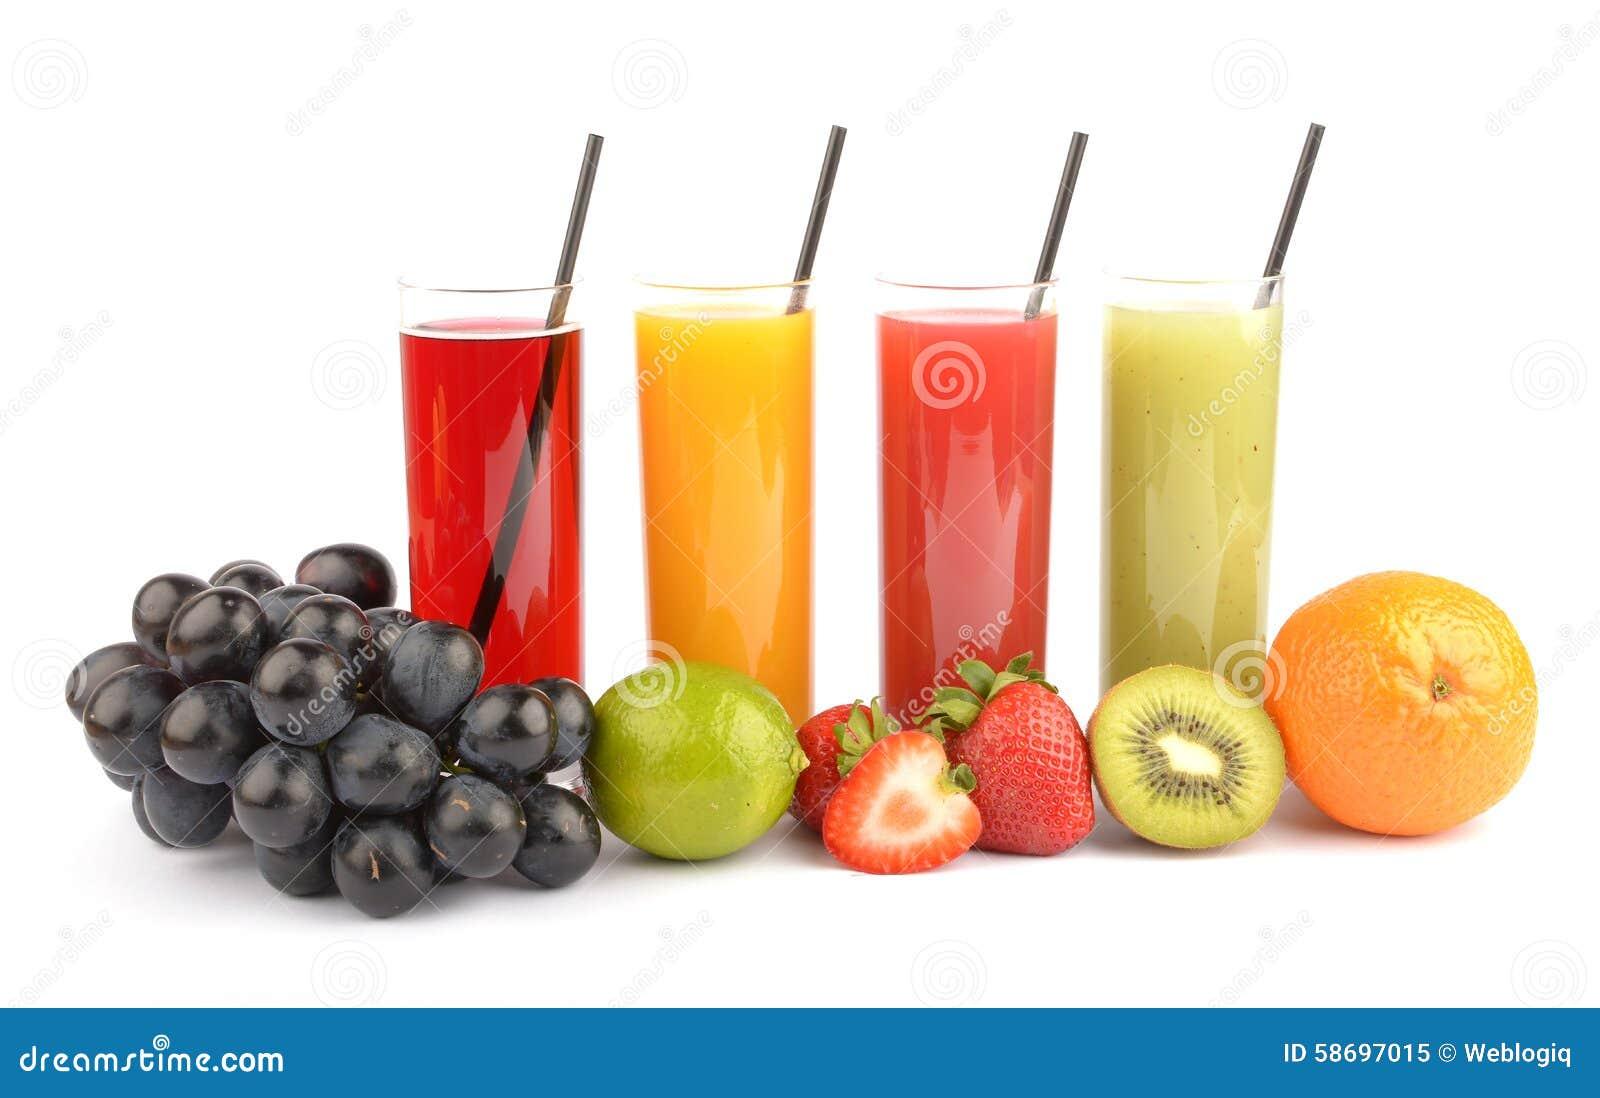 Verse vruchtensappen op wit